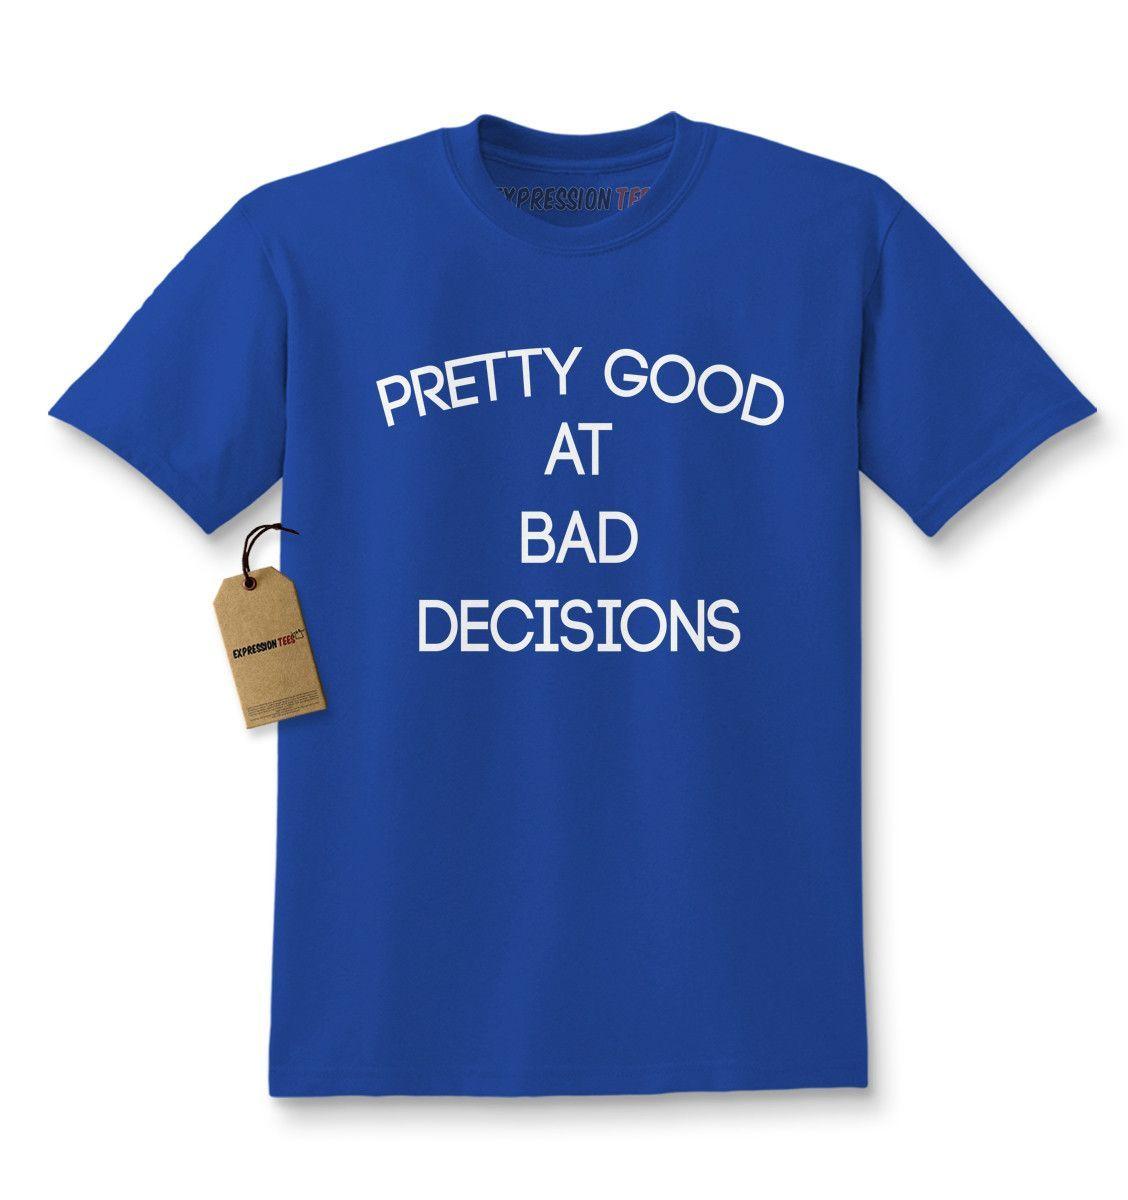 Pretty Good At Bad Decisions Kids T-shirt